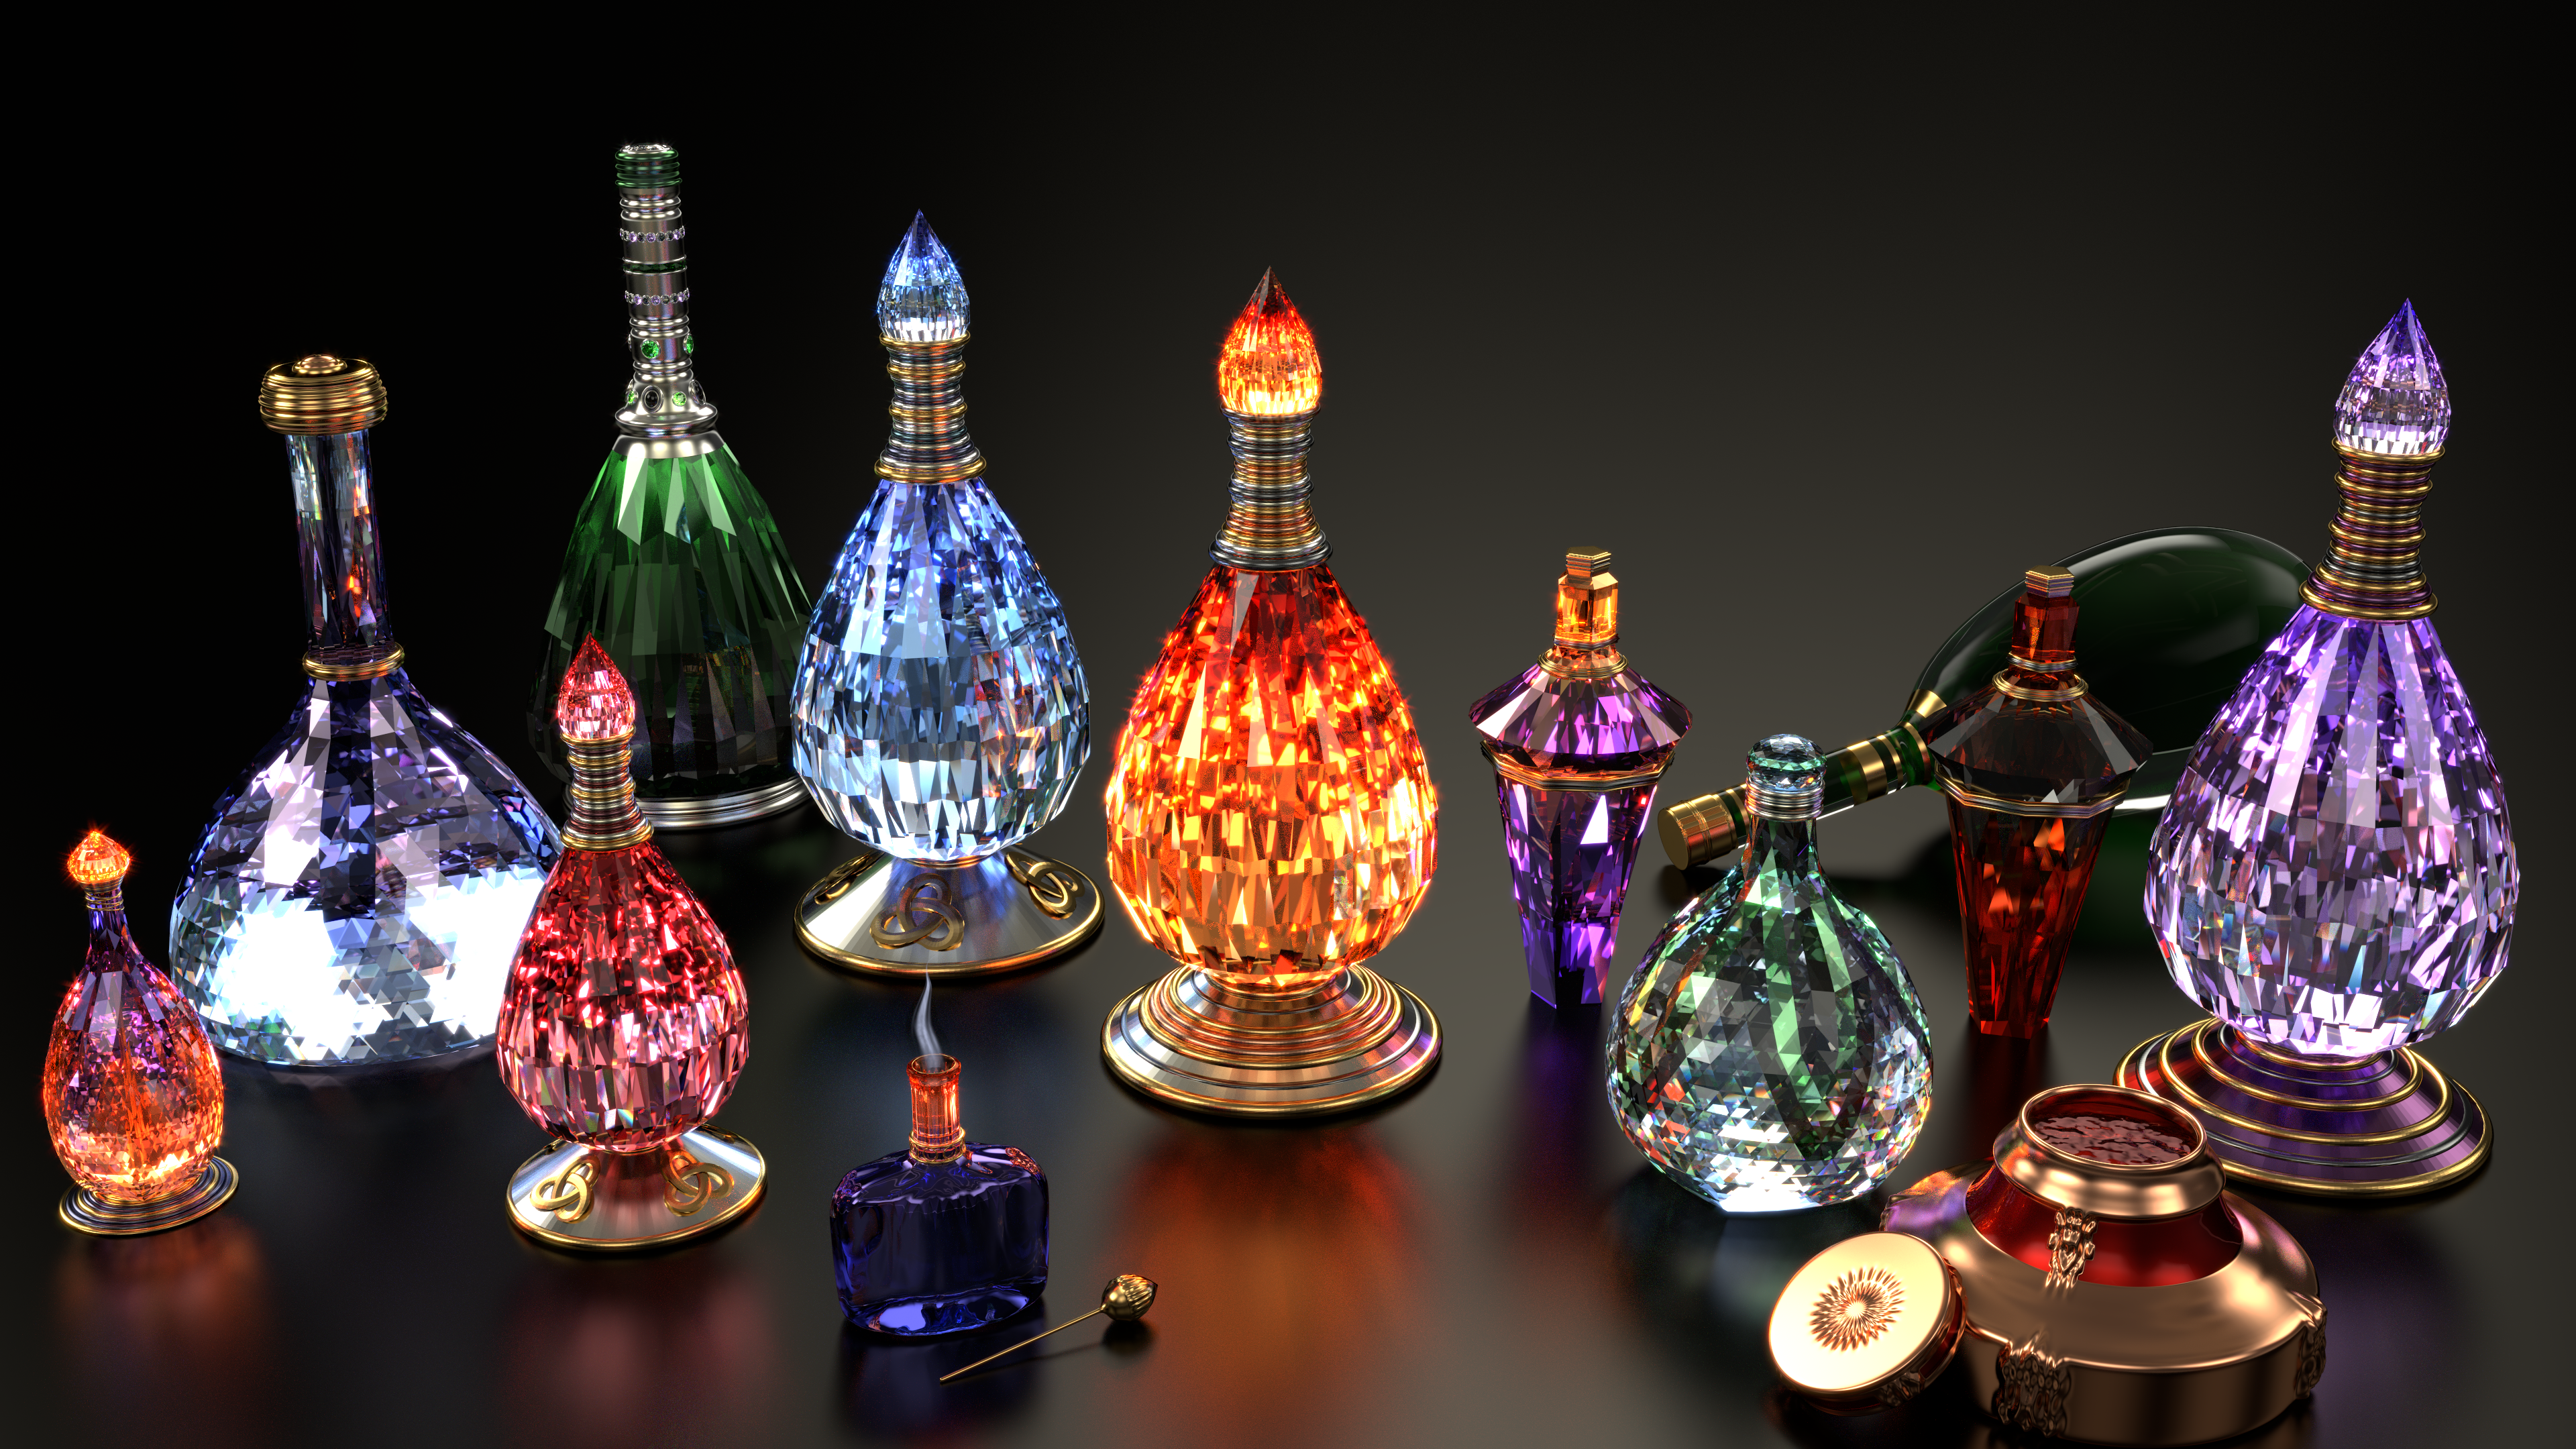 Skyrim Potions By Etrelley On Deviantart Skyrim Potions Love Potion Recipe